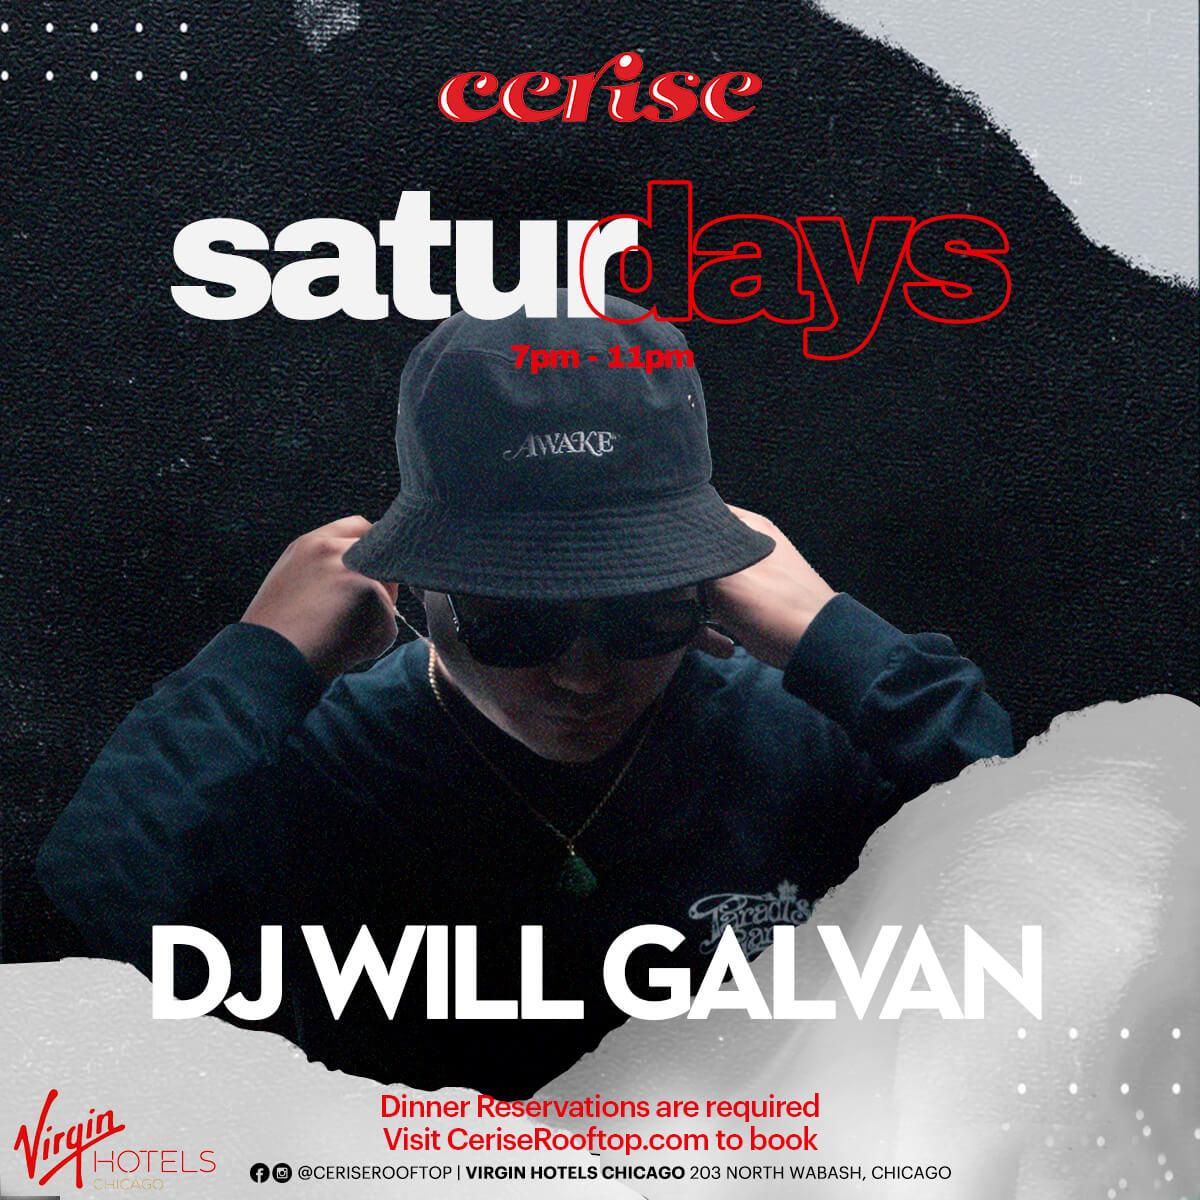 DJ Will Galvan at Cerise